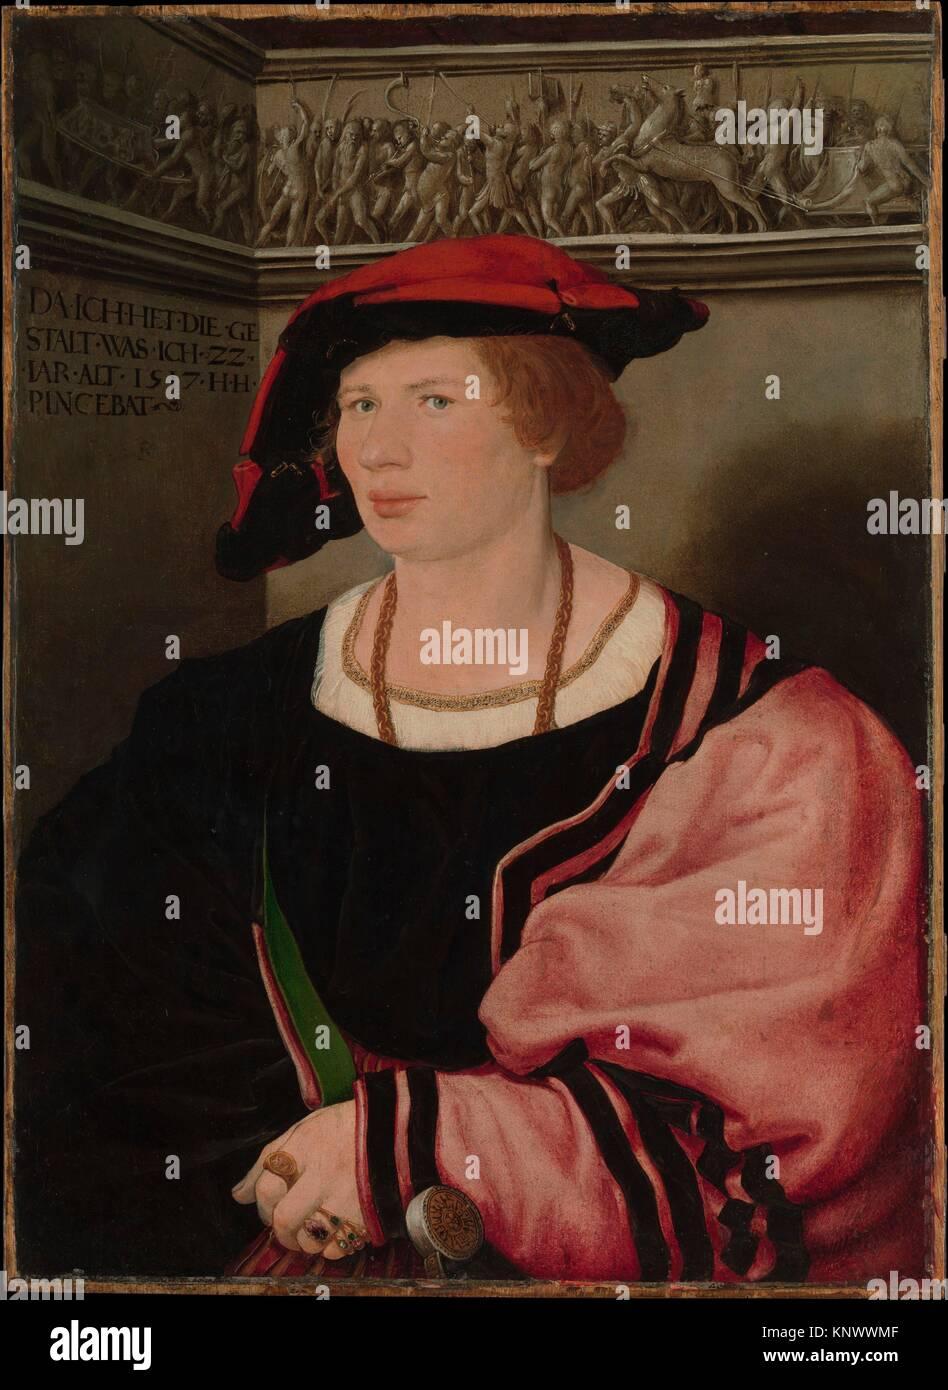 Künstler Augsburg benedikt hertenstein ca 1495 geboren gestorben 1522